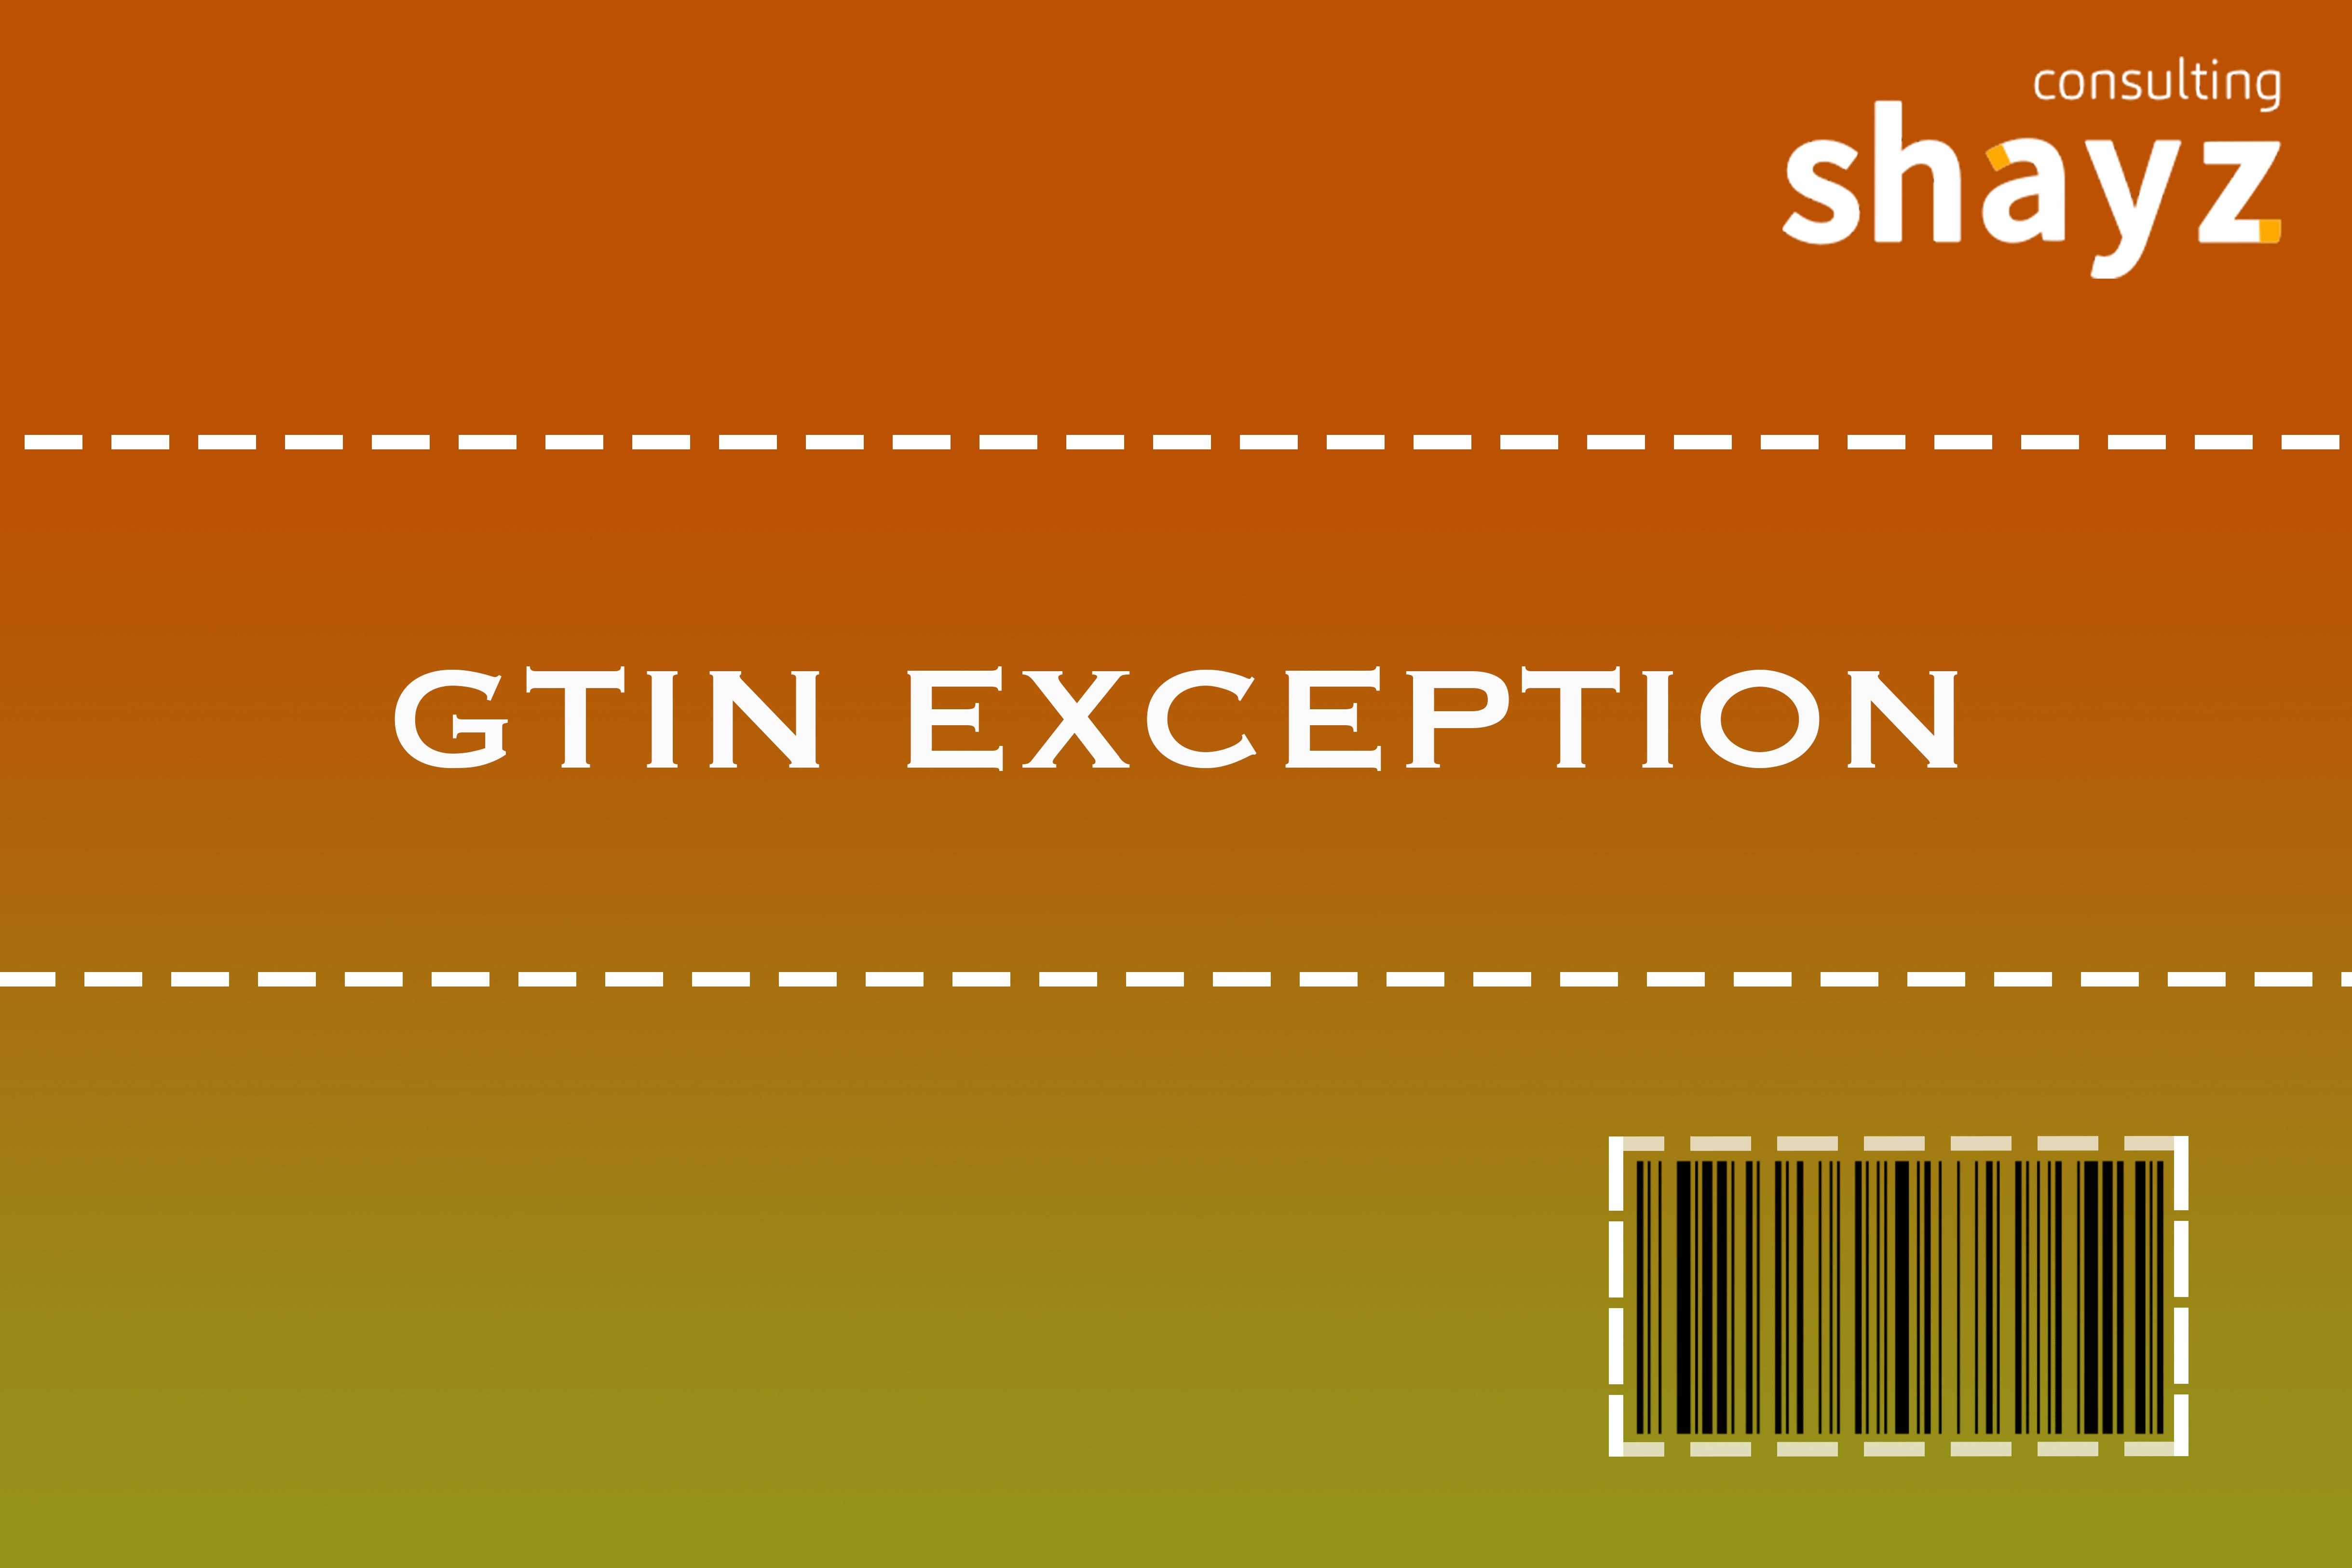 """GTIN Exception"" programa"